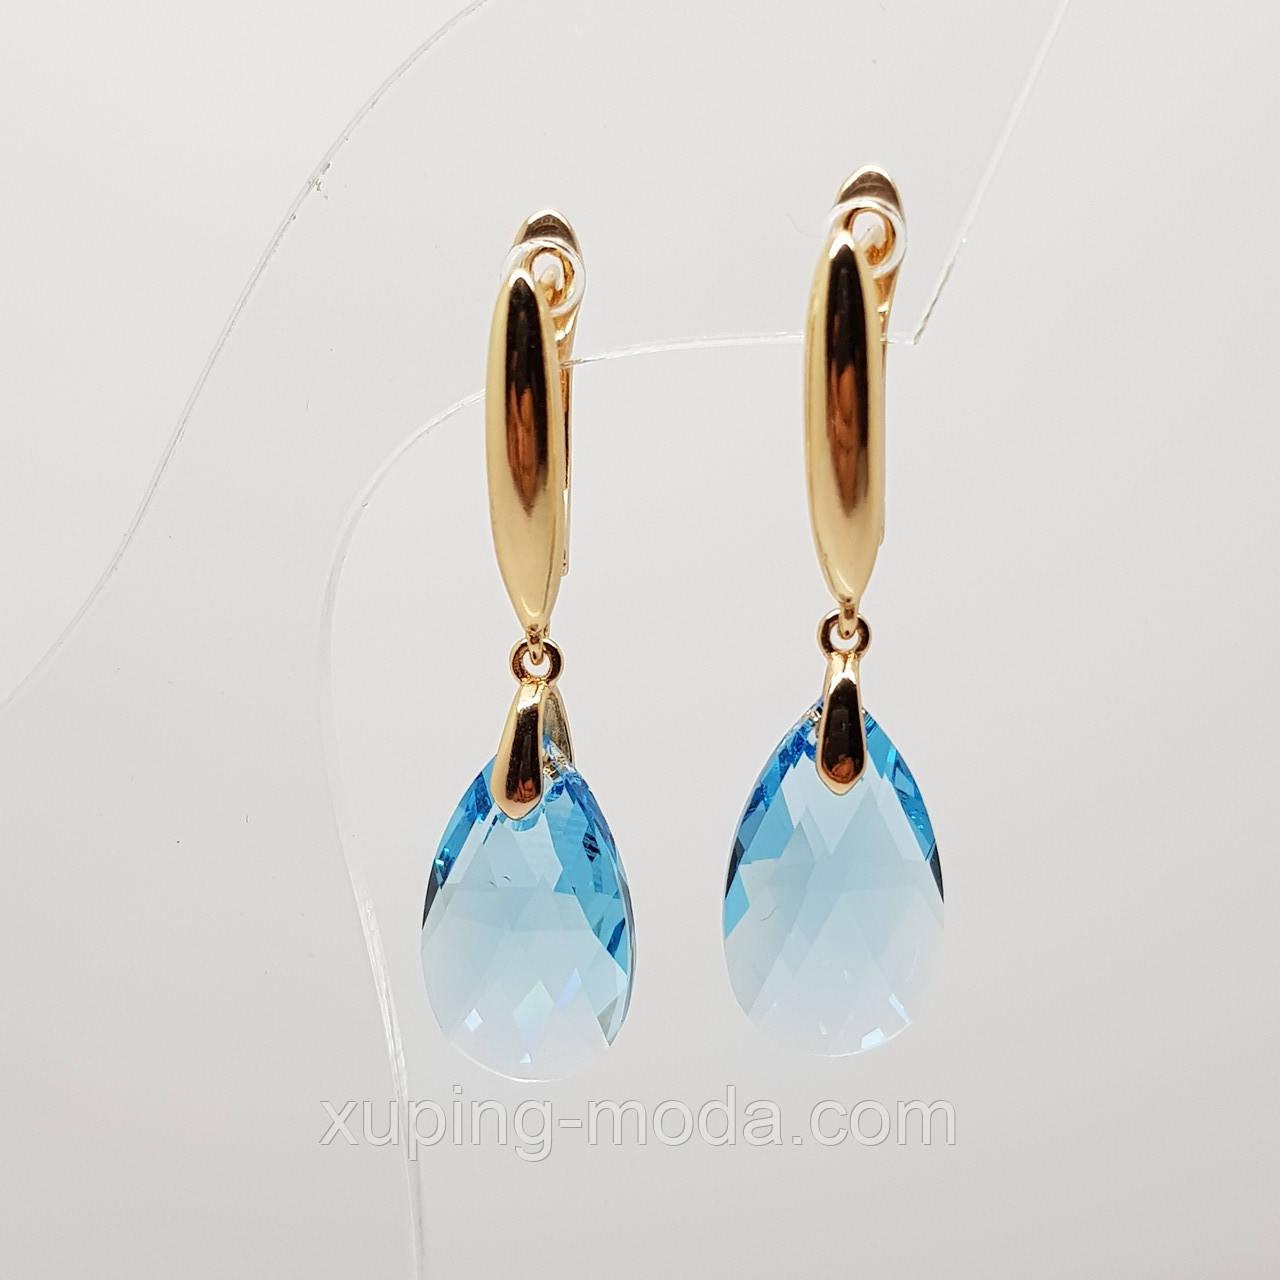 Серьги xuping c кристаллами swarowski, позолота 18к